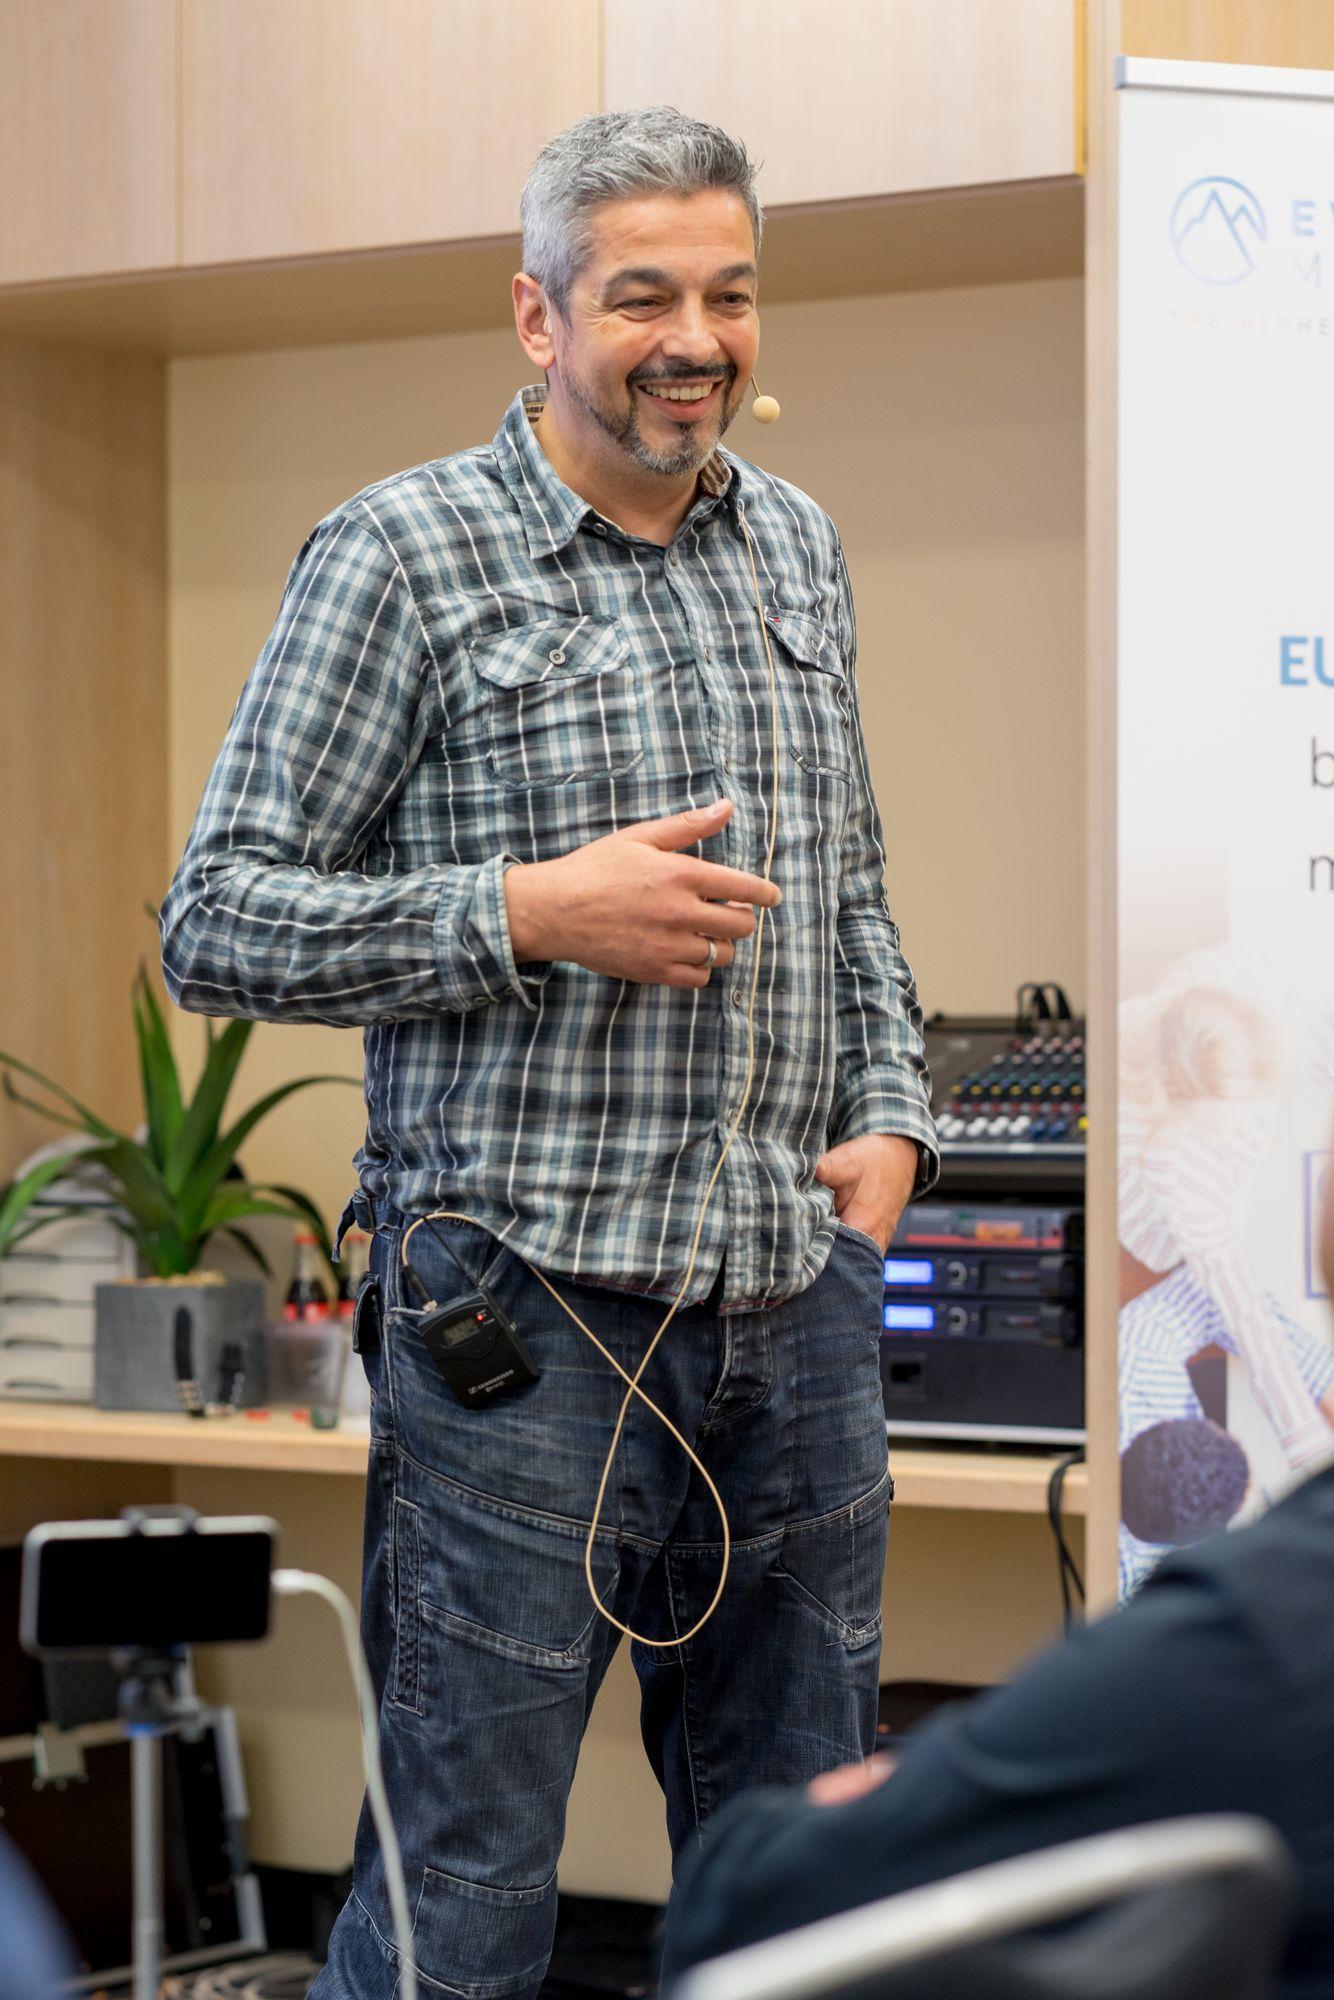 Jean-Claude Capanna als Sprecher auf dem Builderall Everest 2018 in Nürnberg (Germany)